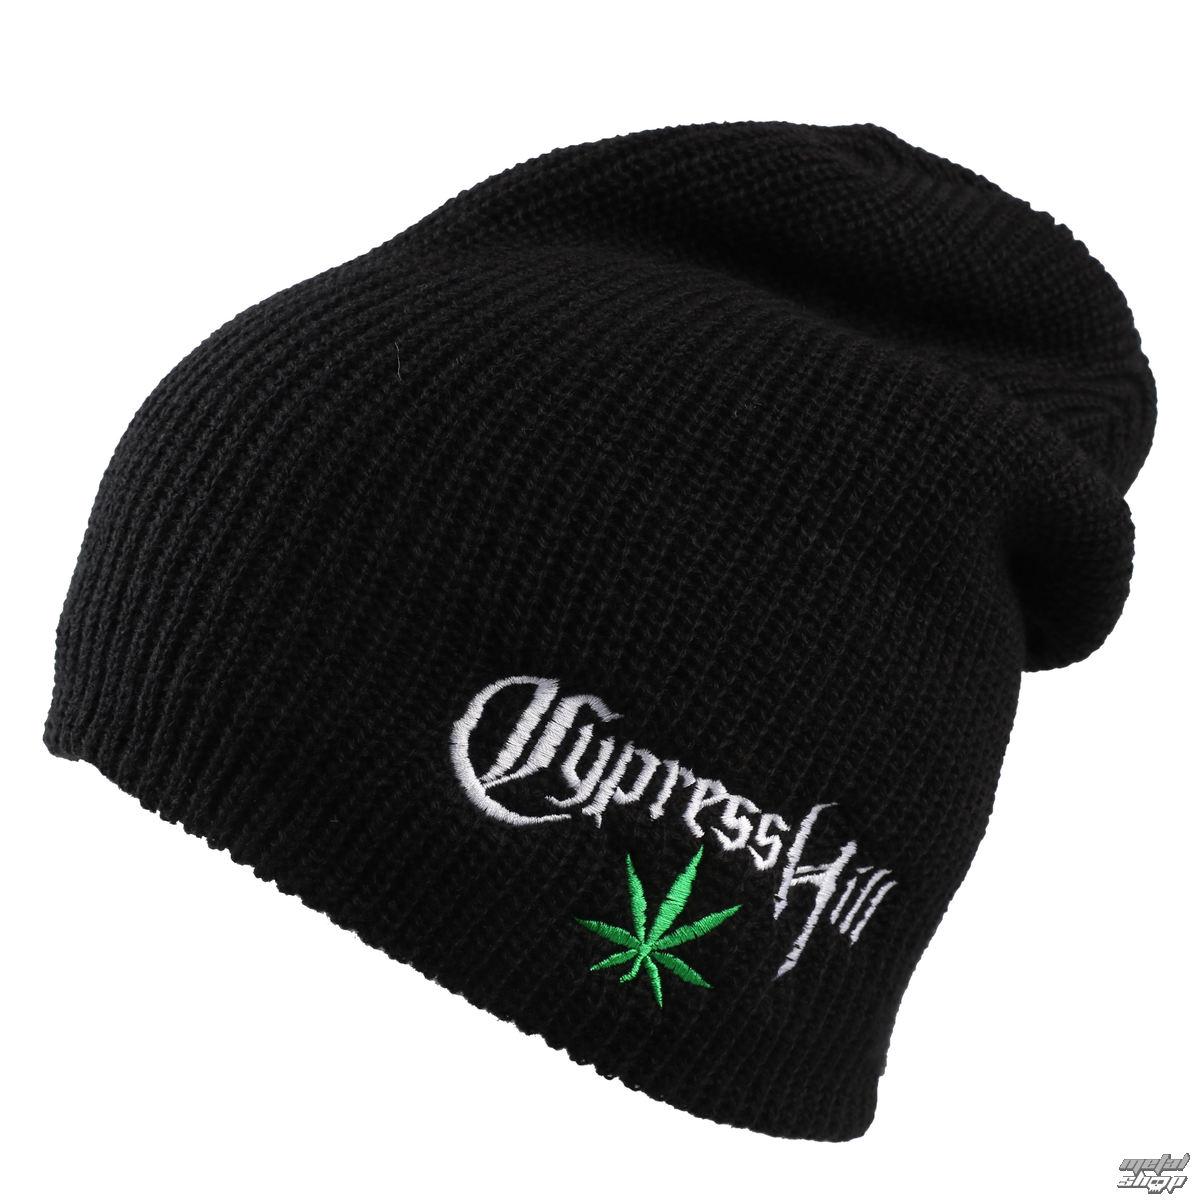 Beanie cypress hill leaf logo black rtcphbeblog JPG 1192x1200 Cypress hill  cap e9dcf148aa4d